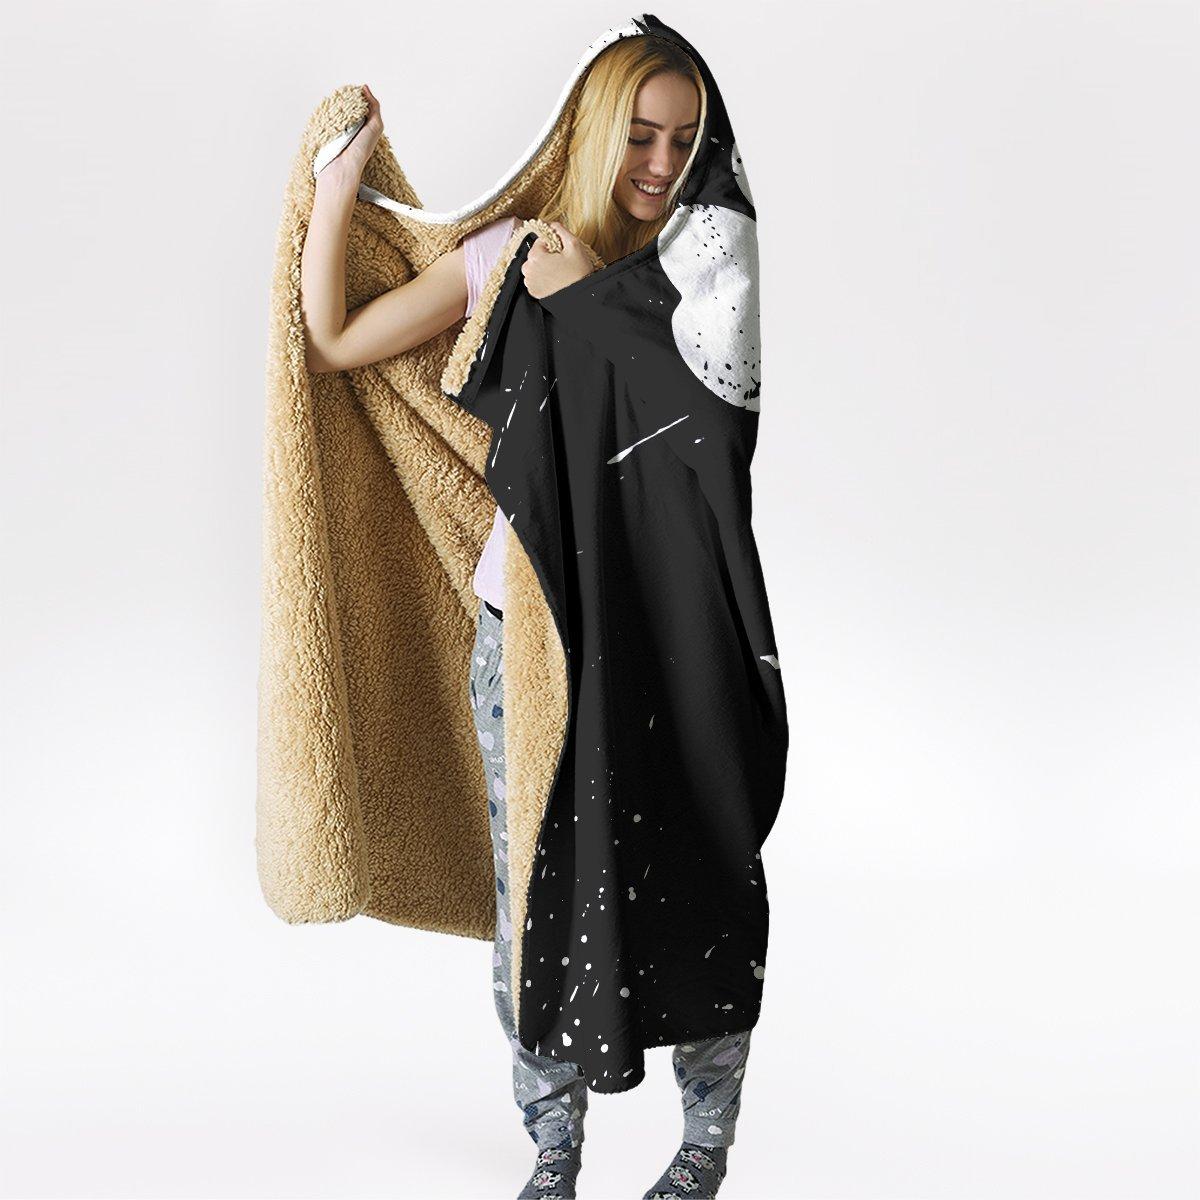 five leaf clover hooded blanket 935094 - Otaku Treat